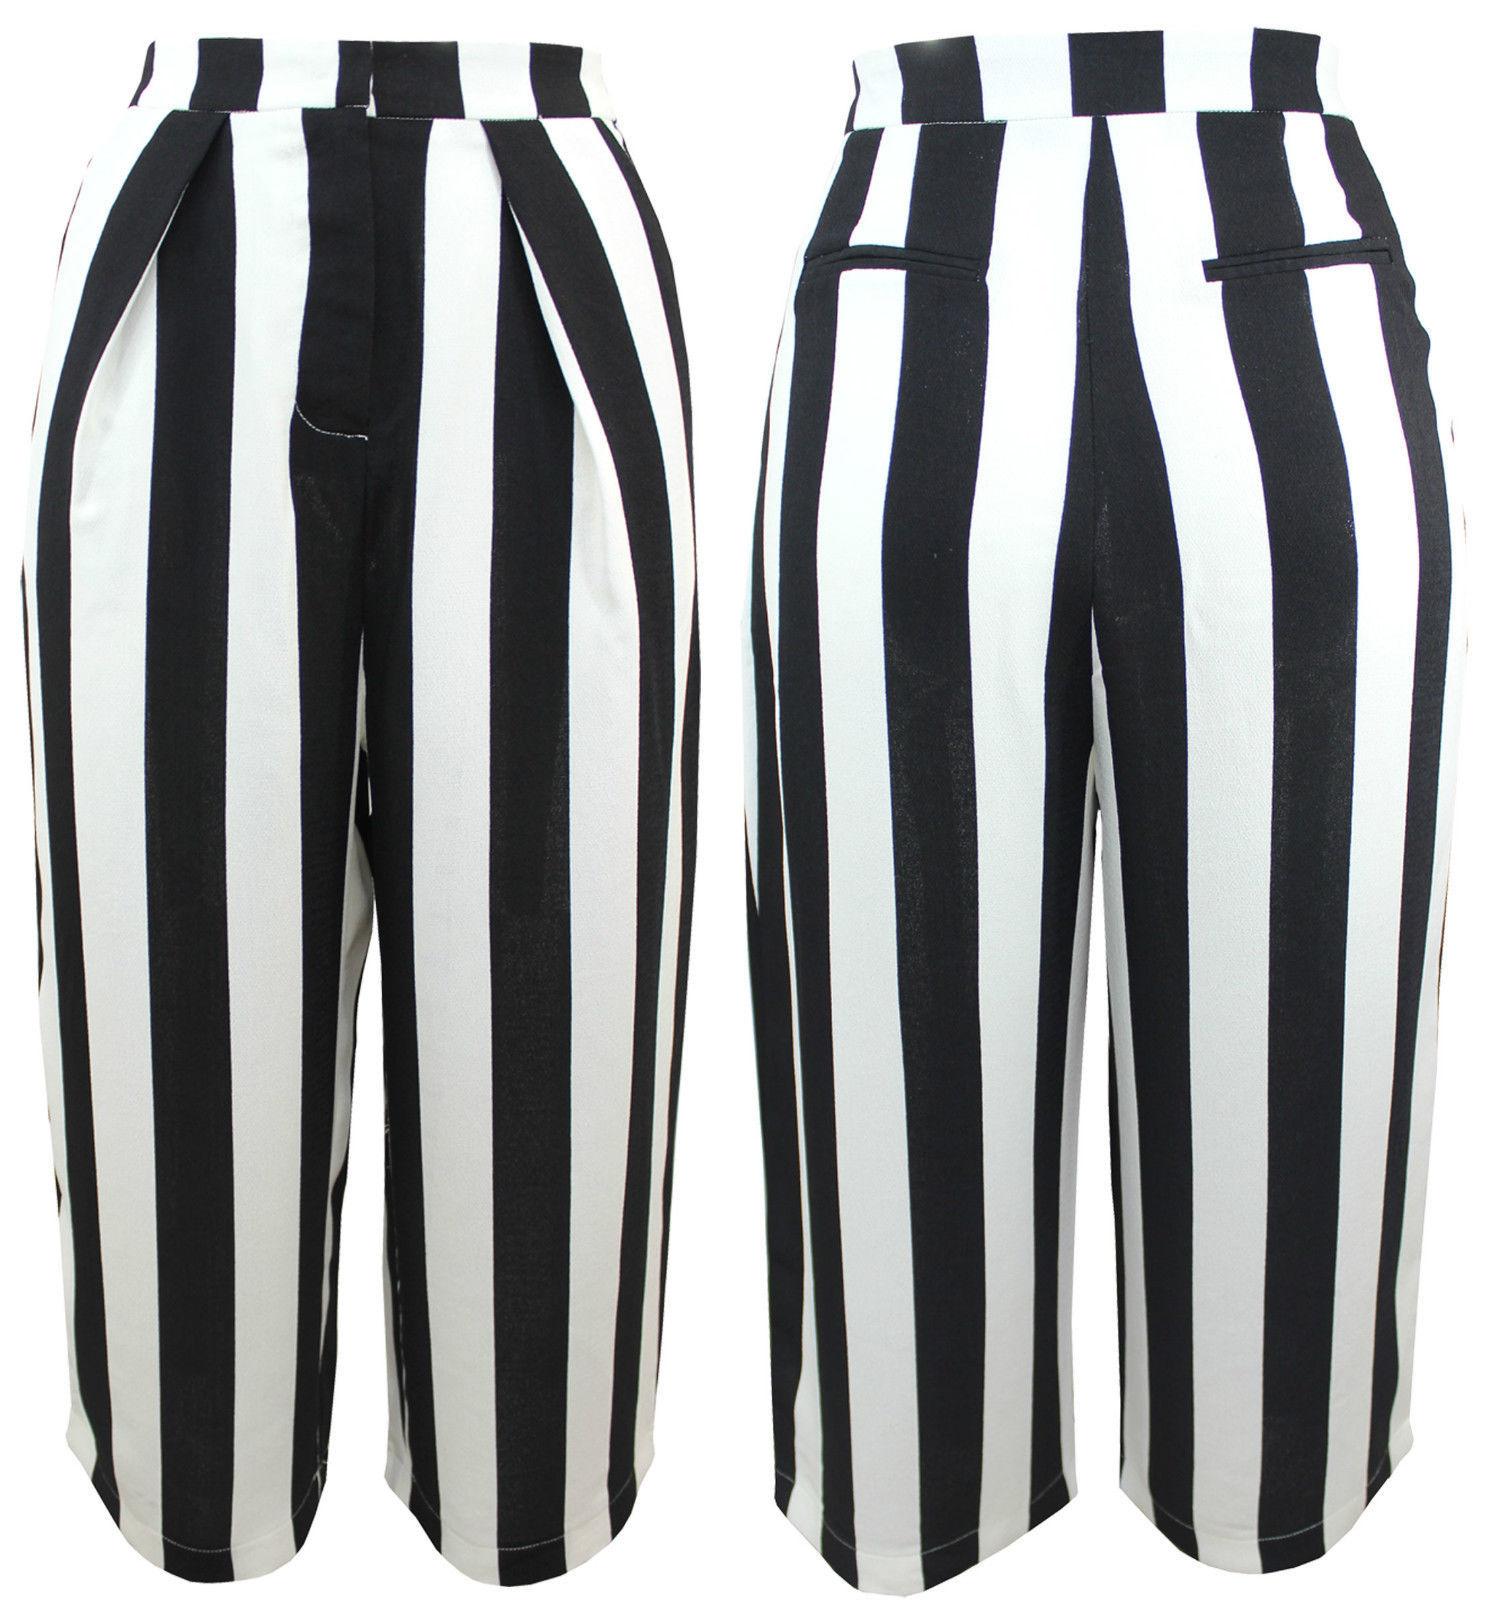 femme chic rayure culottes 3 4 pantalon pour jambe large taille haute 8 14 pants. Black Bedroom Furniture Sets. Home Design Ideas